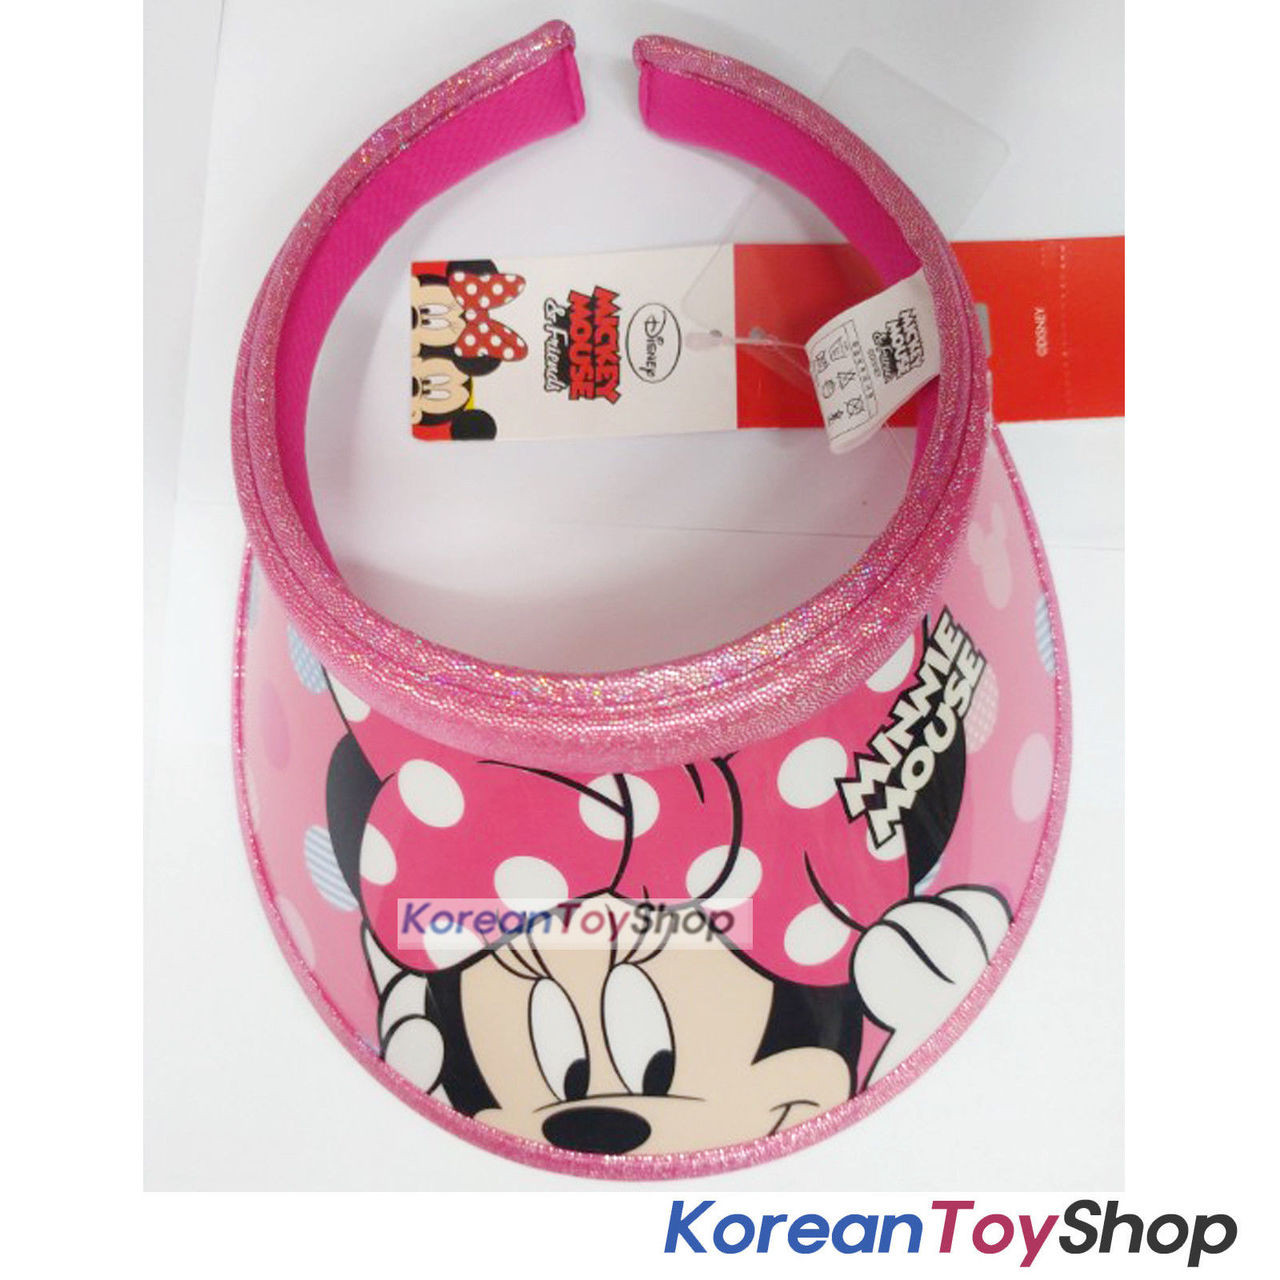 Disney Minnie Mouse Visor Hat Sun Cap Kids Girl Pink Designed Korea  Original - KoreanToyShop cd84d13d70d